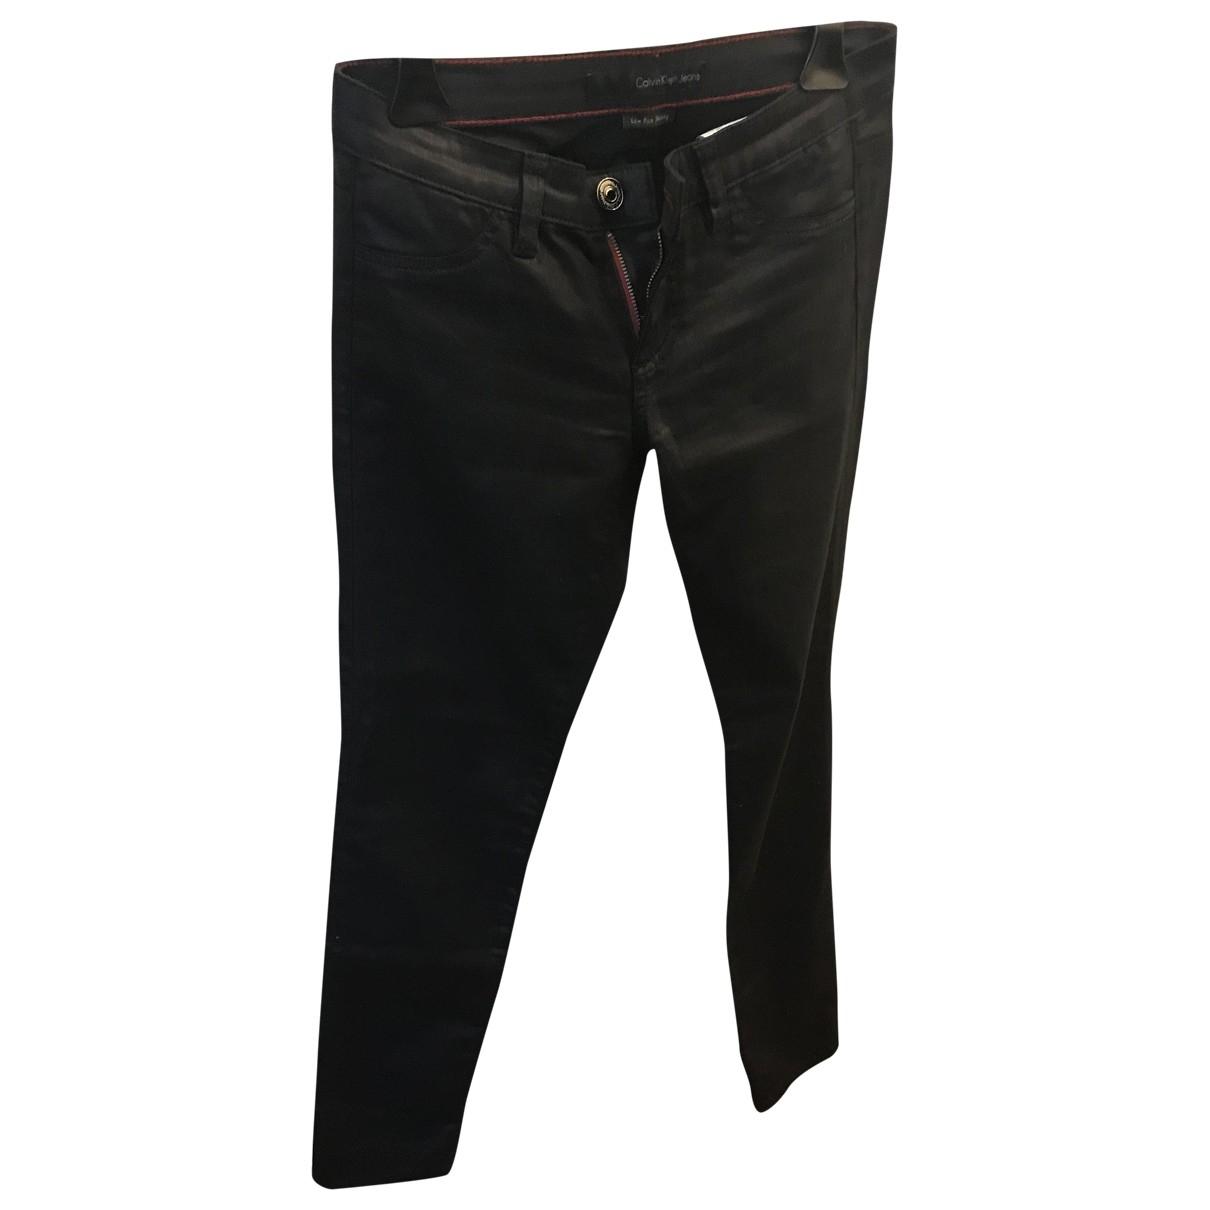 Calvin Klein \N Black Cotton - elasthane Jeans for Women 27 US